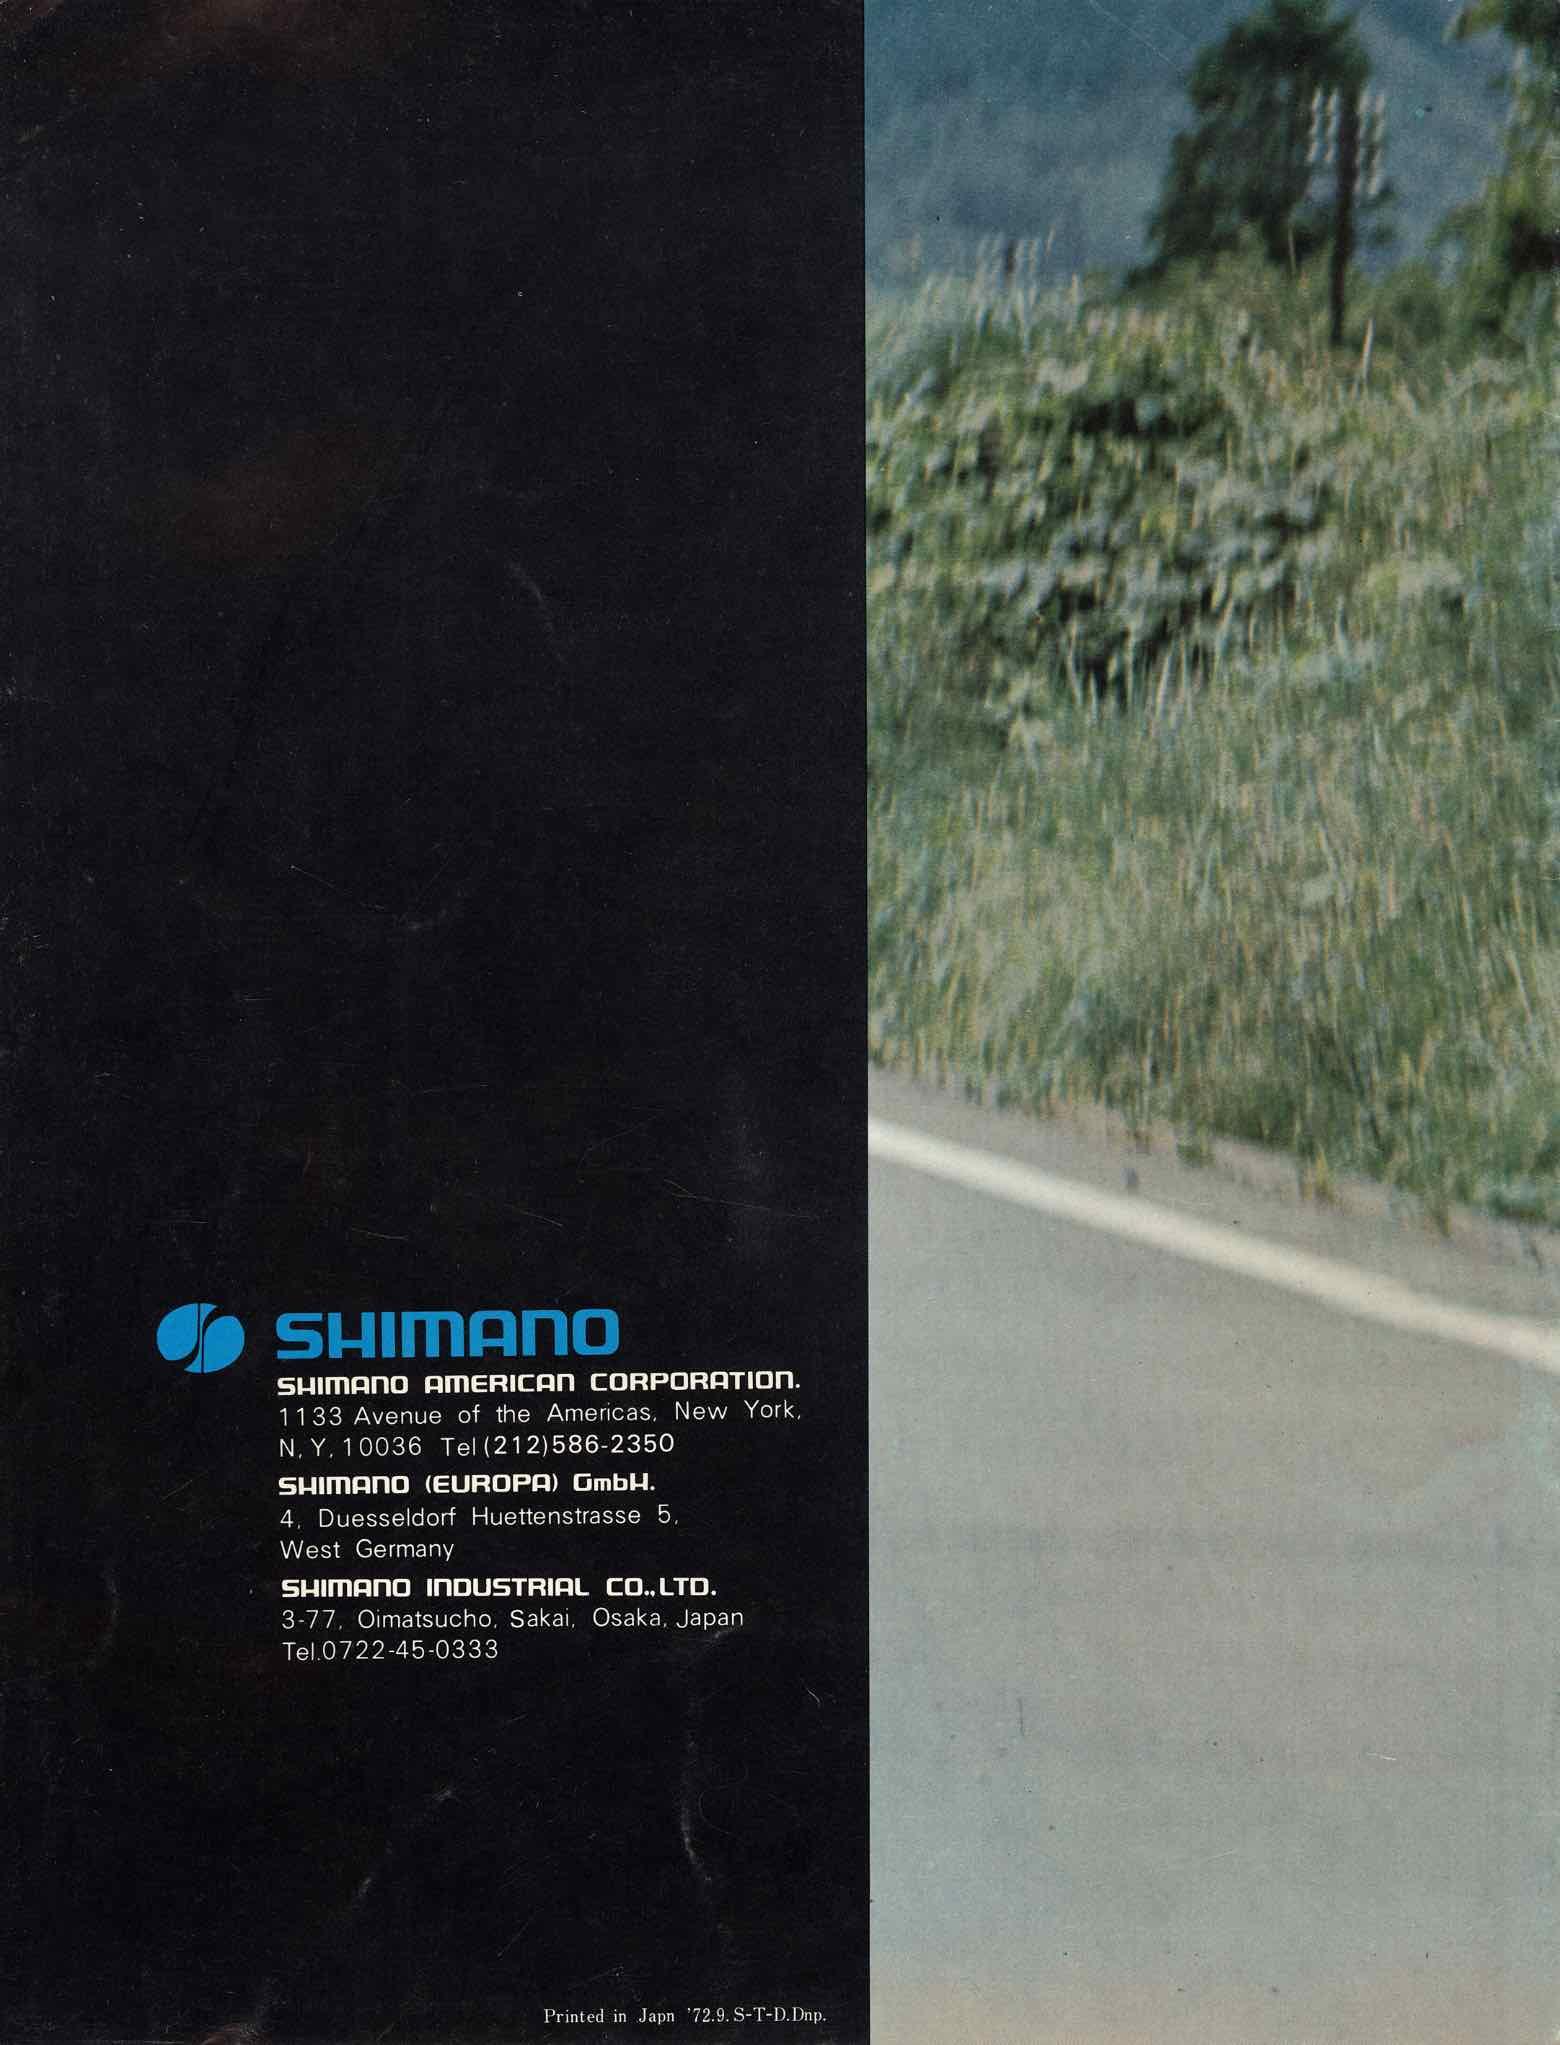 Shimano Bicycle Parts 72 Rear Cover